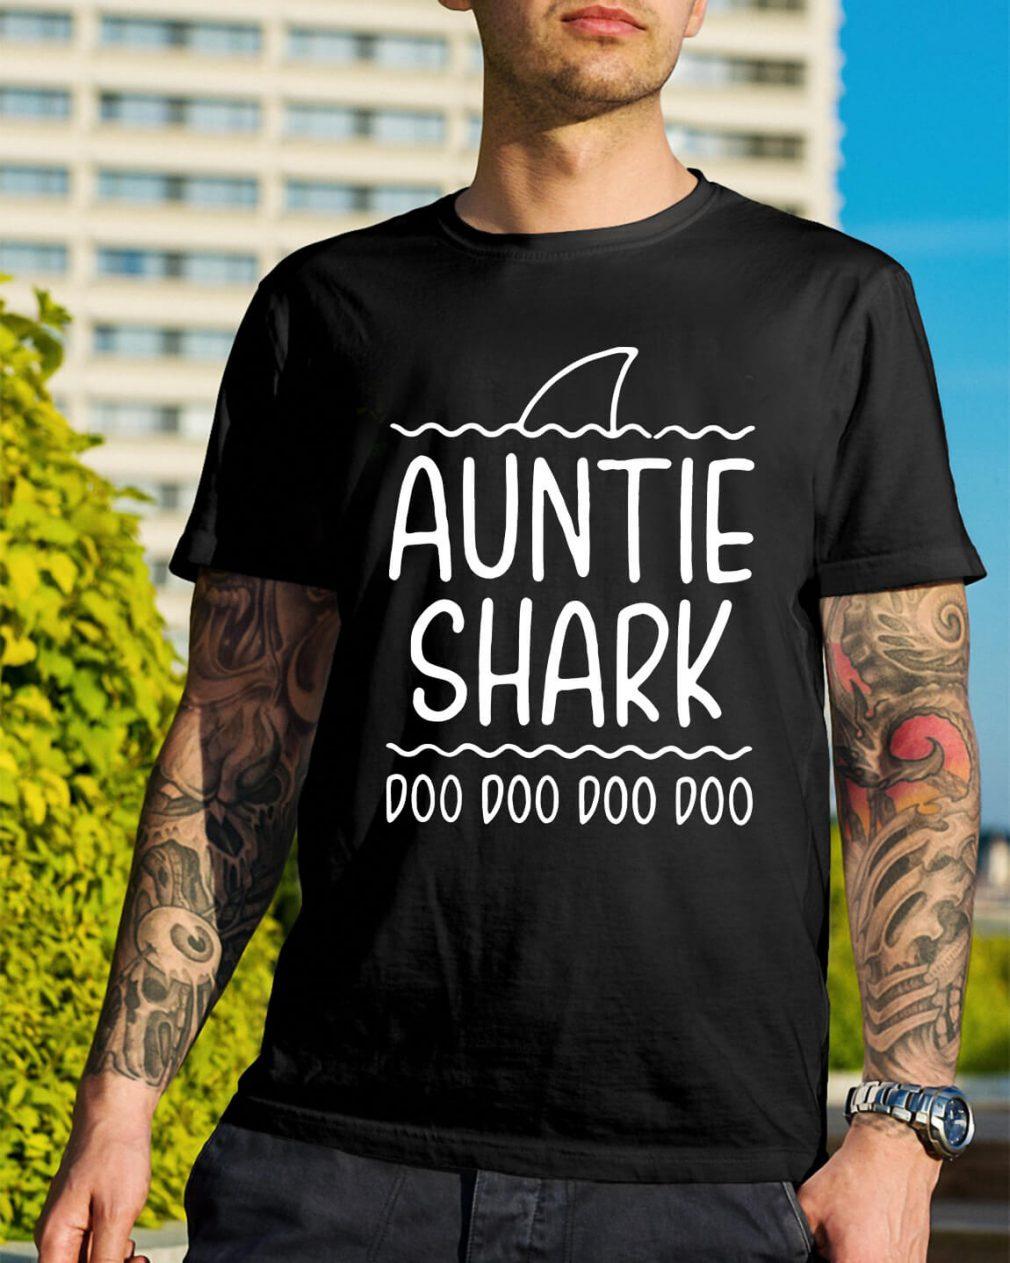 Auntie shark doo doo doo doo shirt